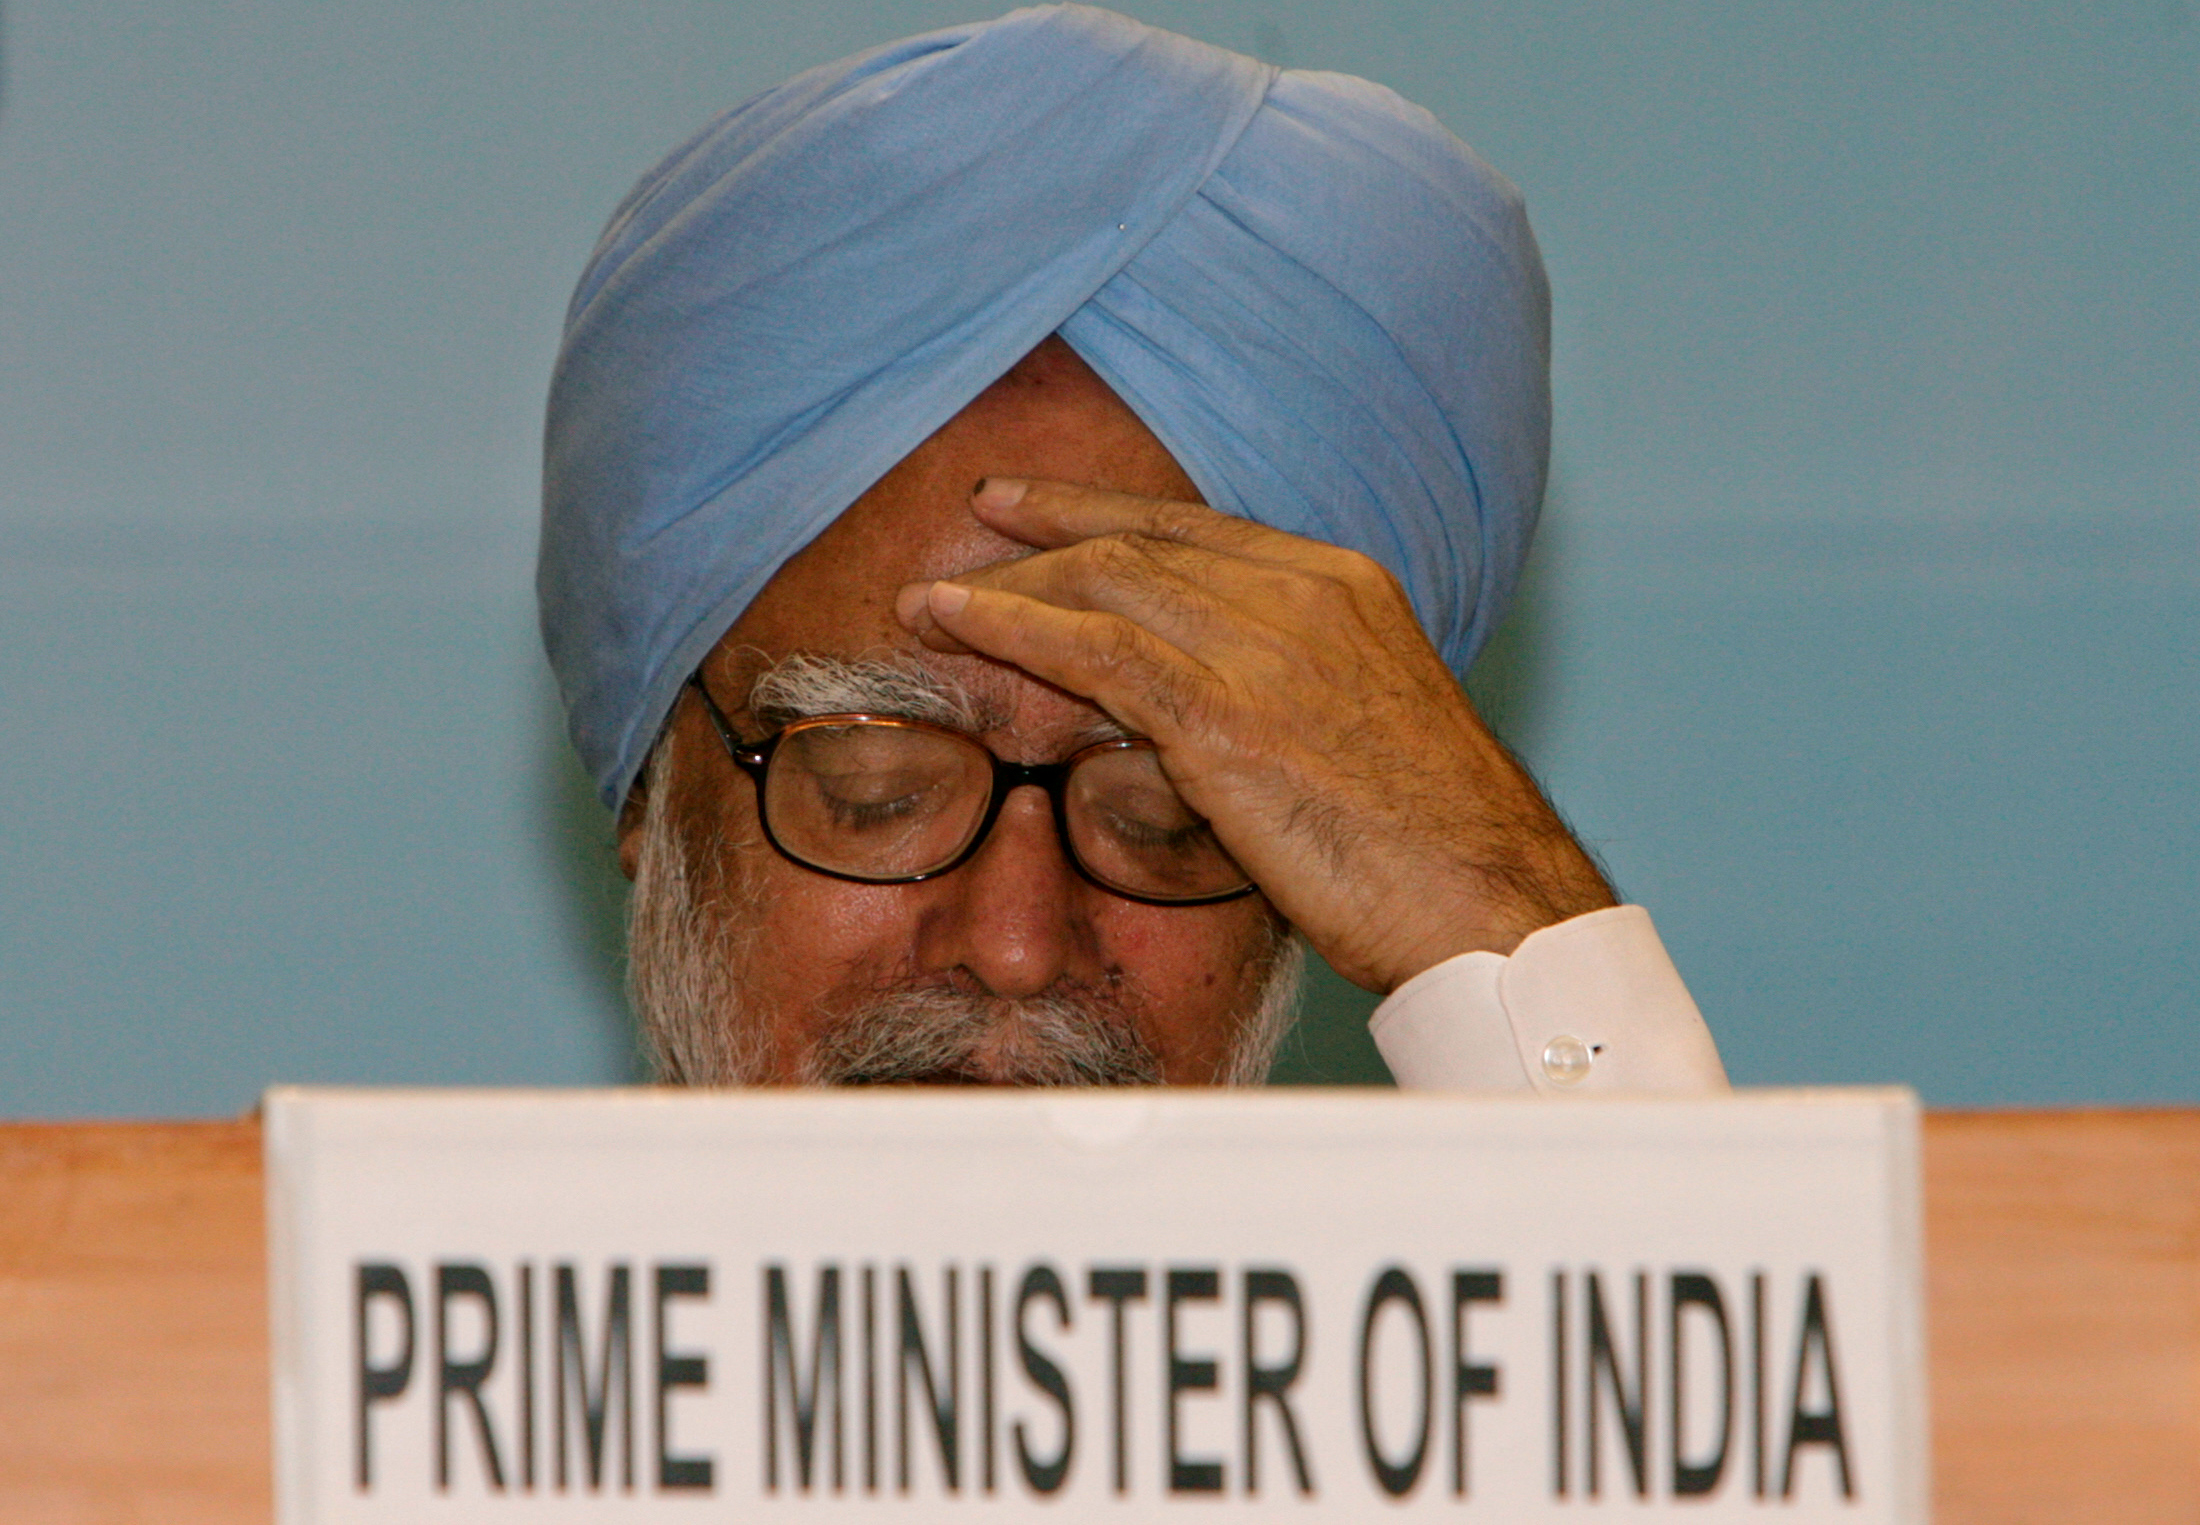 India's prime minister